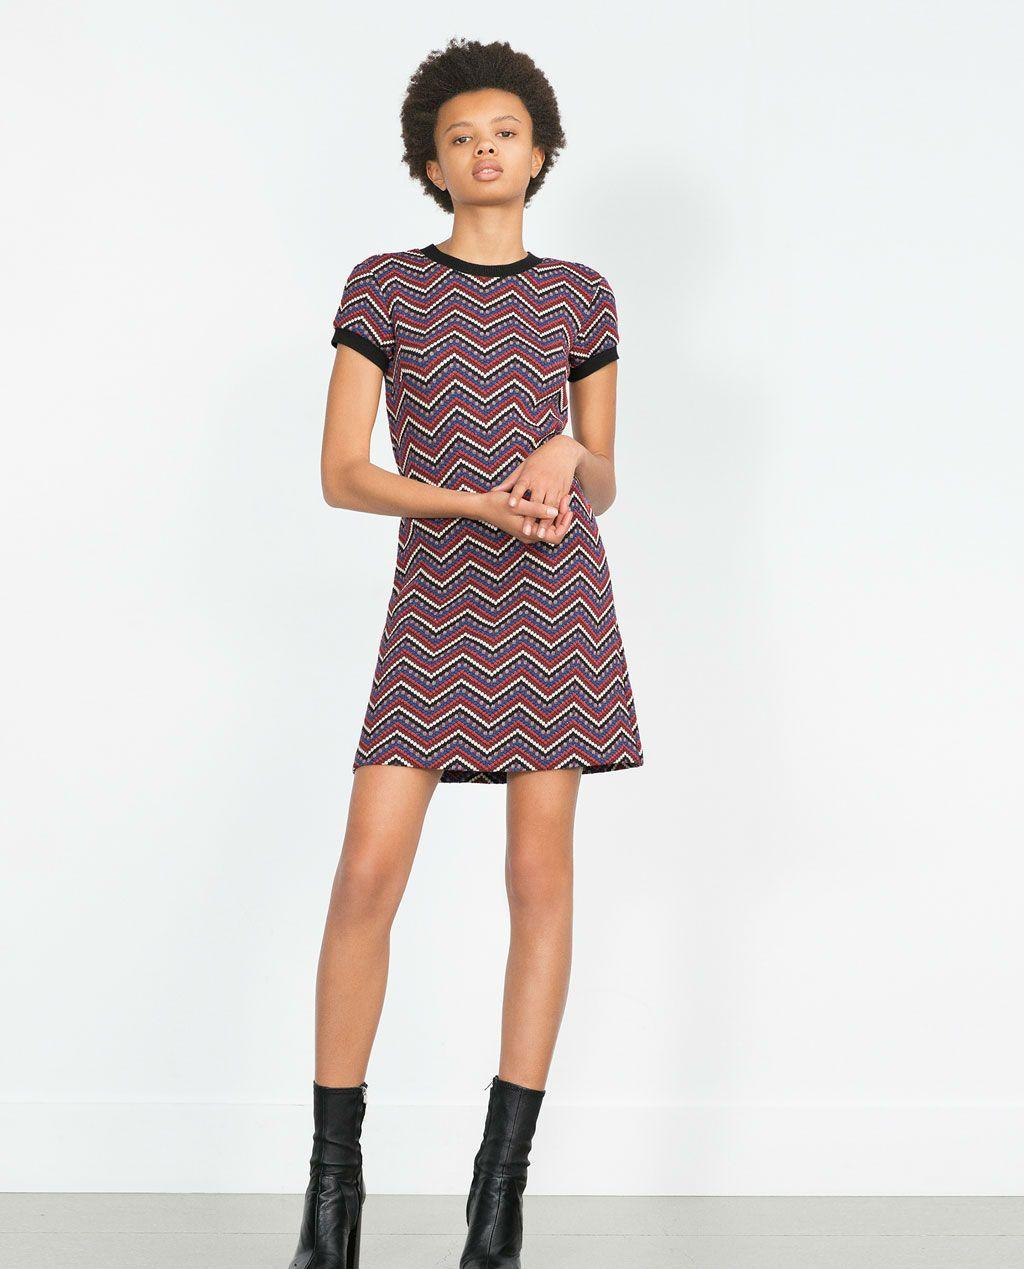 Avance colección primavera verano 2016 de Zara   ss 2016